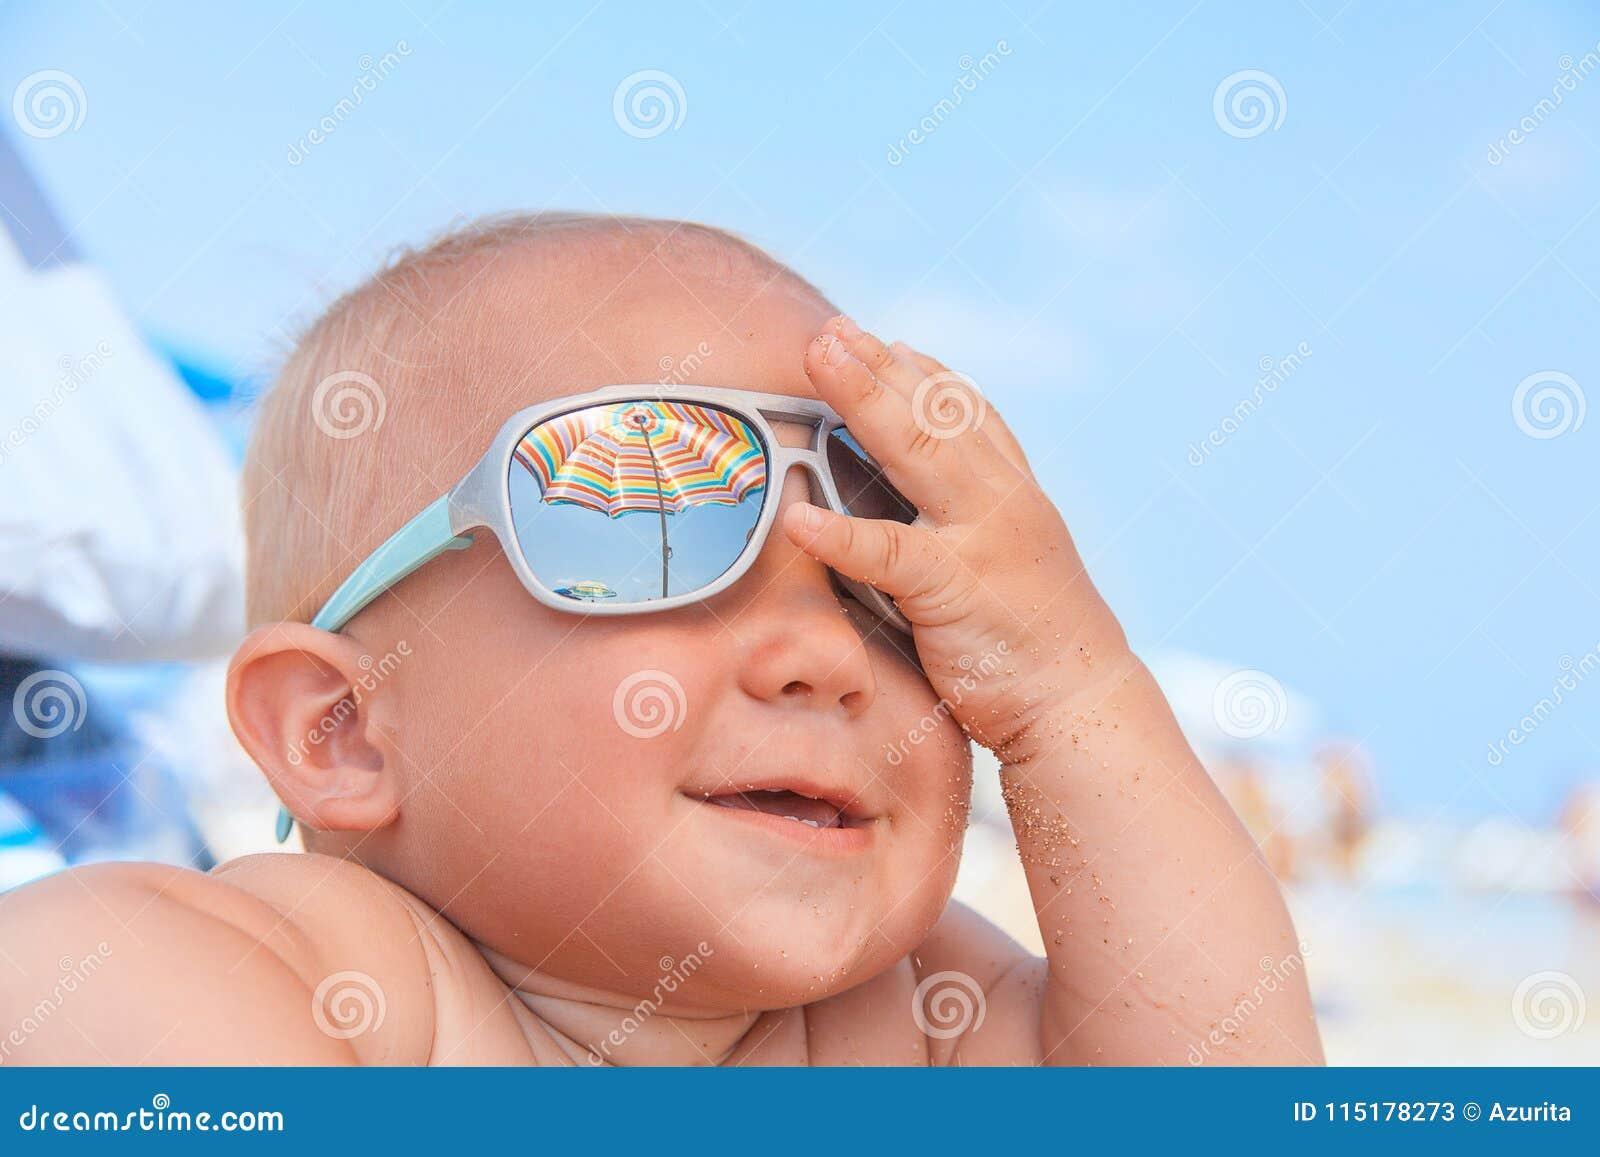 c2b7933ca1 Λατρευτό ευτυχές αστείο χαμογελώντας χαριτωμένο αγοράκι με τα γυαλιά ηλίου  στην παραλία